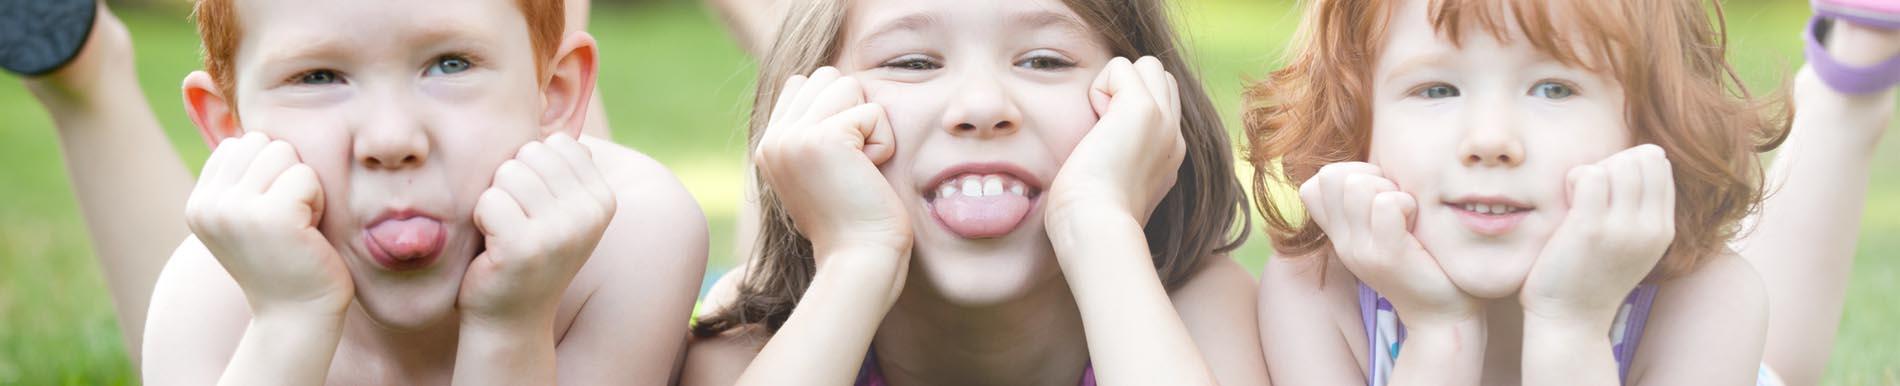 https://www.healthychildren.org/SiteCollectionImage-Homepage-Banners/TooMuchSun_Banner.jpg